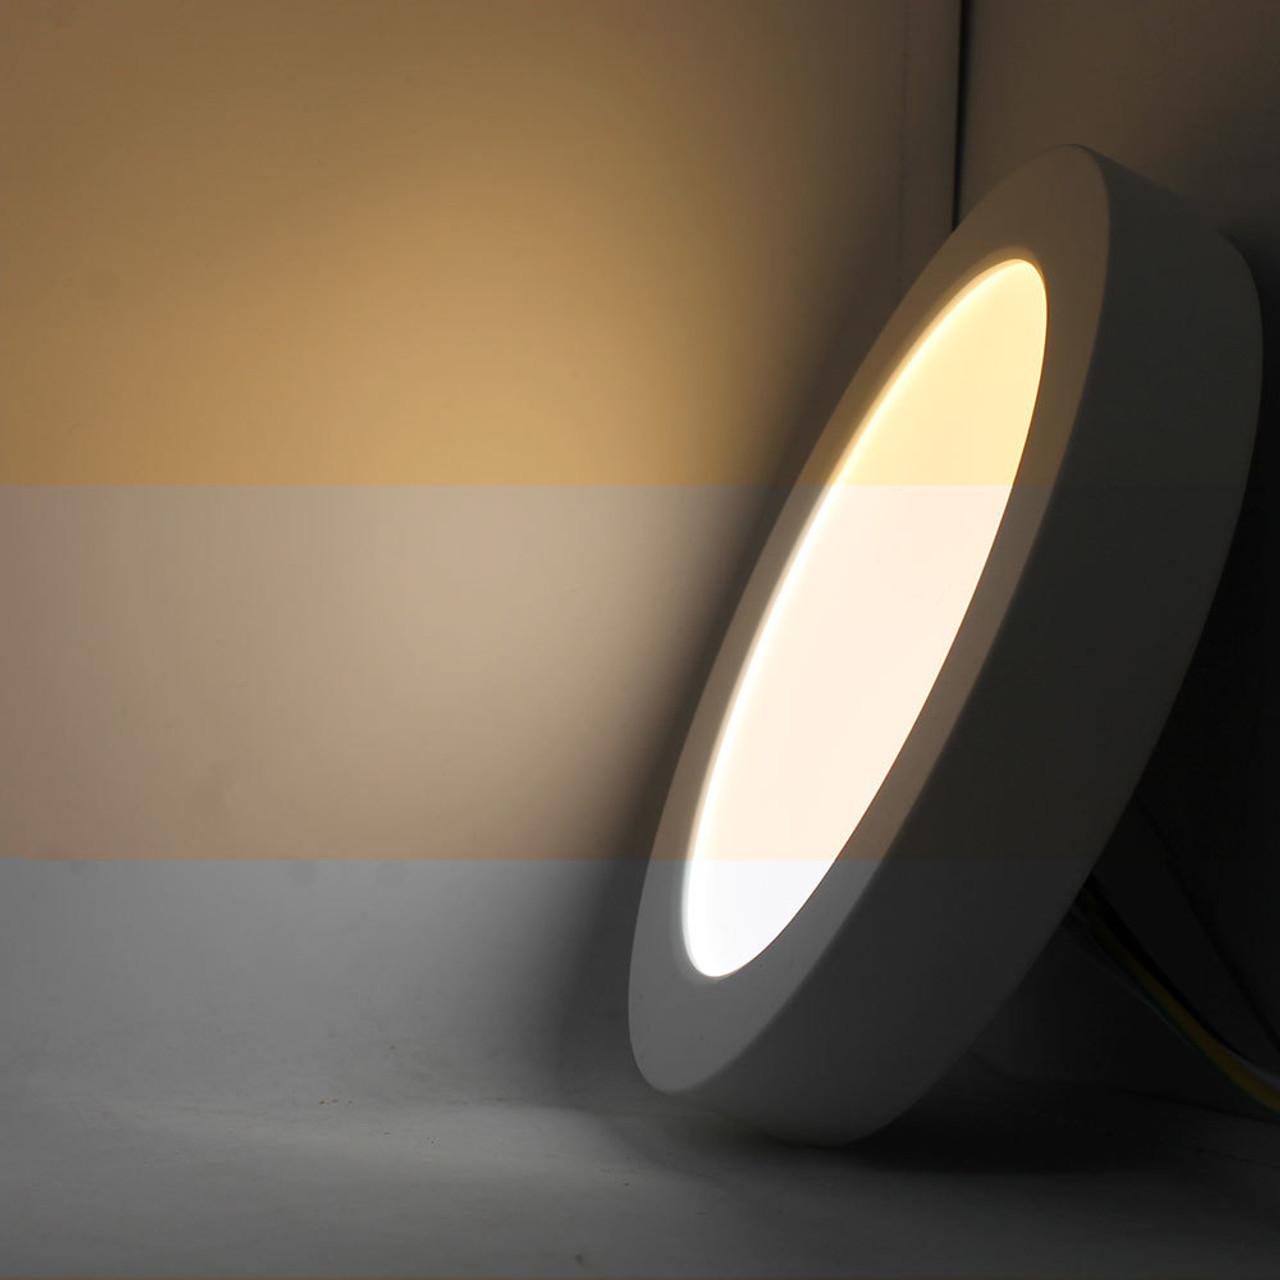 Flush Mounted Ceiling Lights